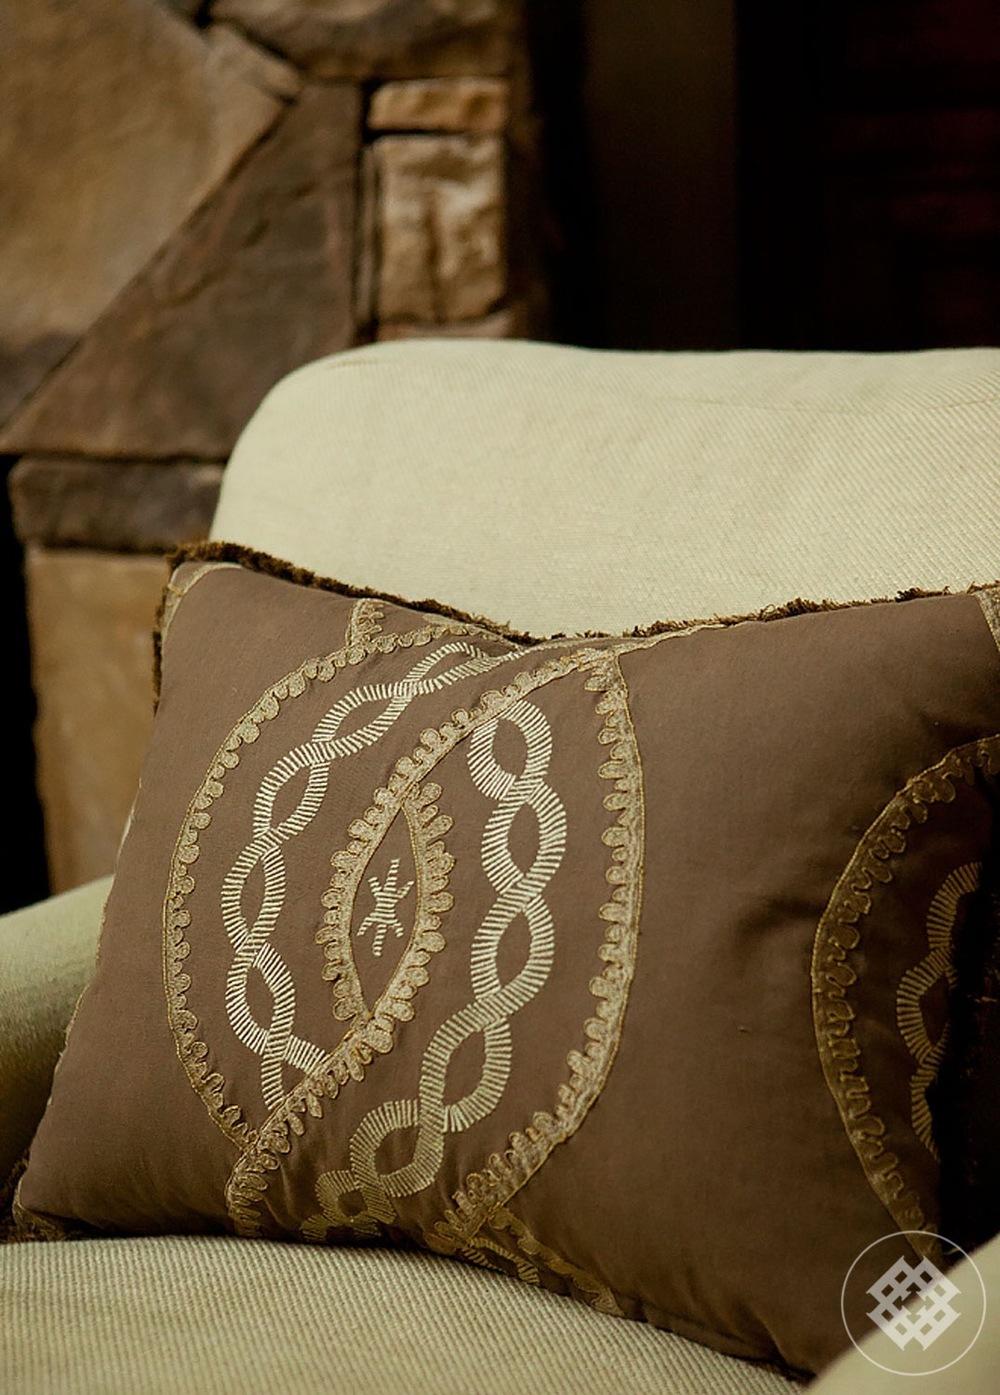 mcm-pillow-1075x1500.jpg